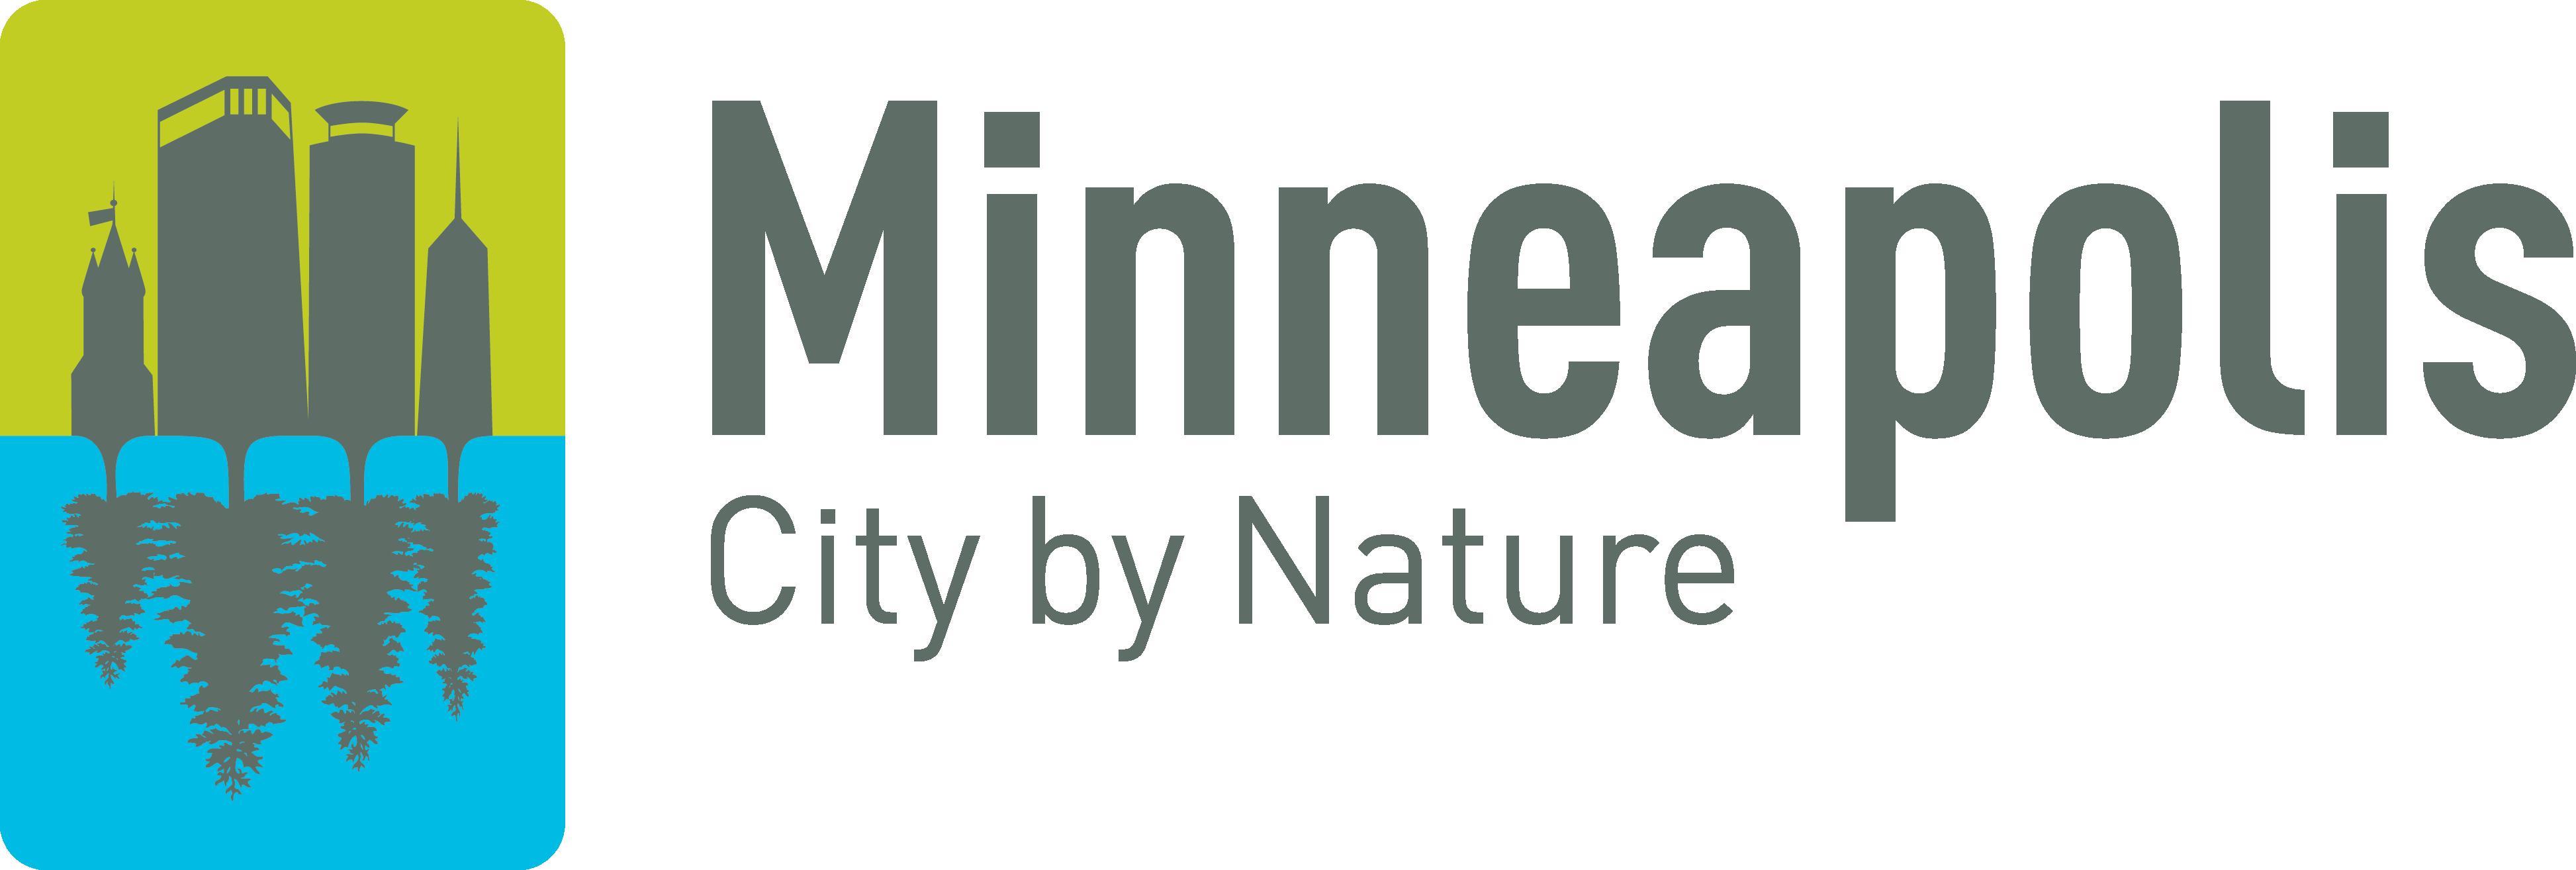 Meet Minneapolis City by Nature Logo